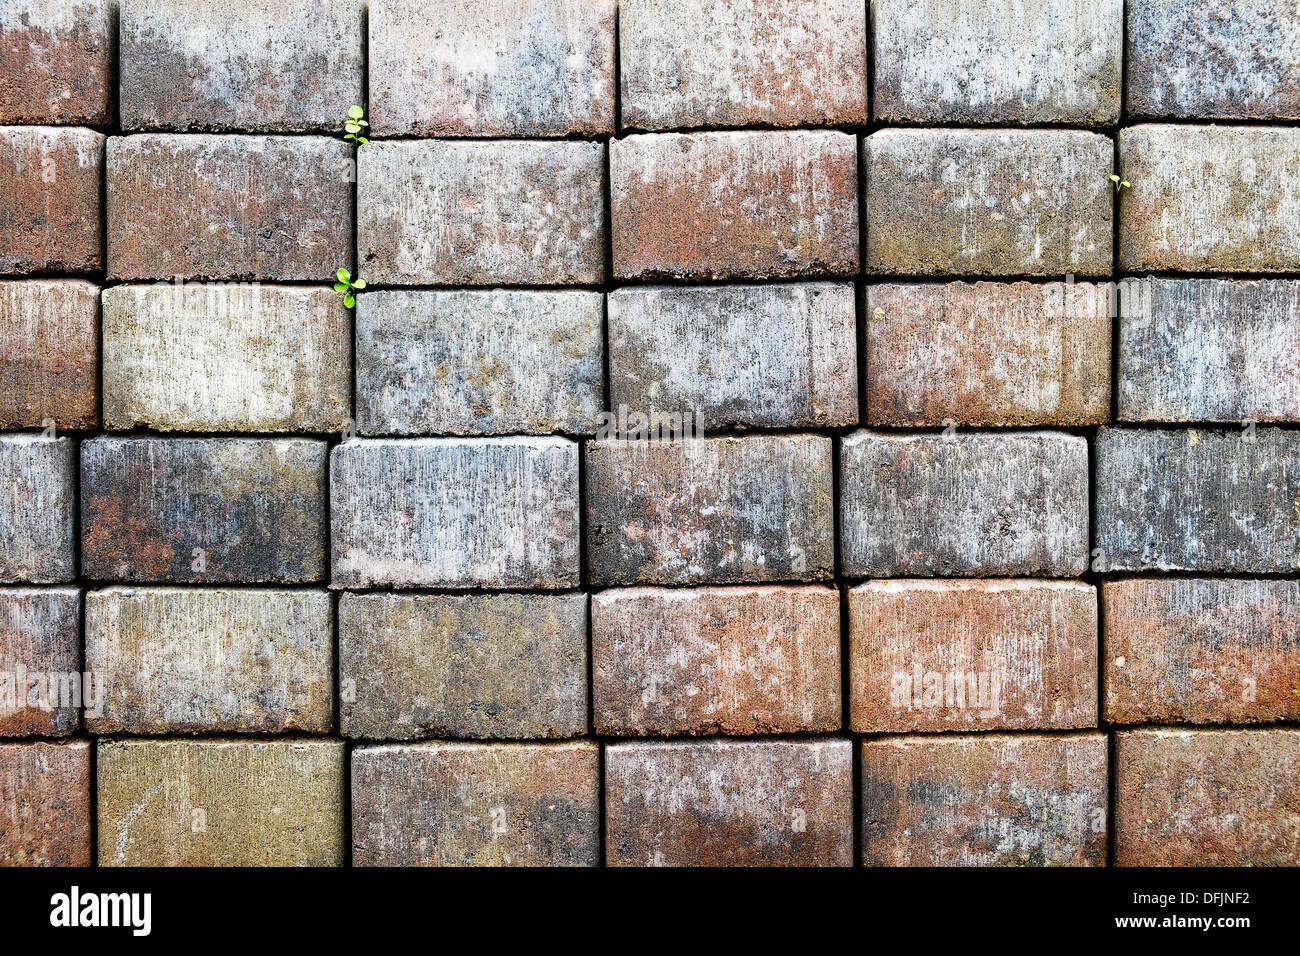 Stacked bricks forming a regular pattern - Stock Image